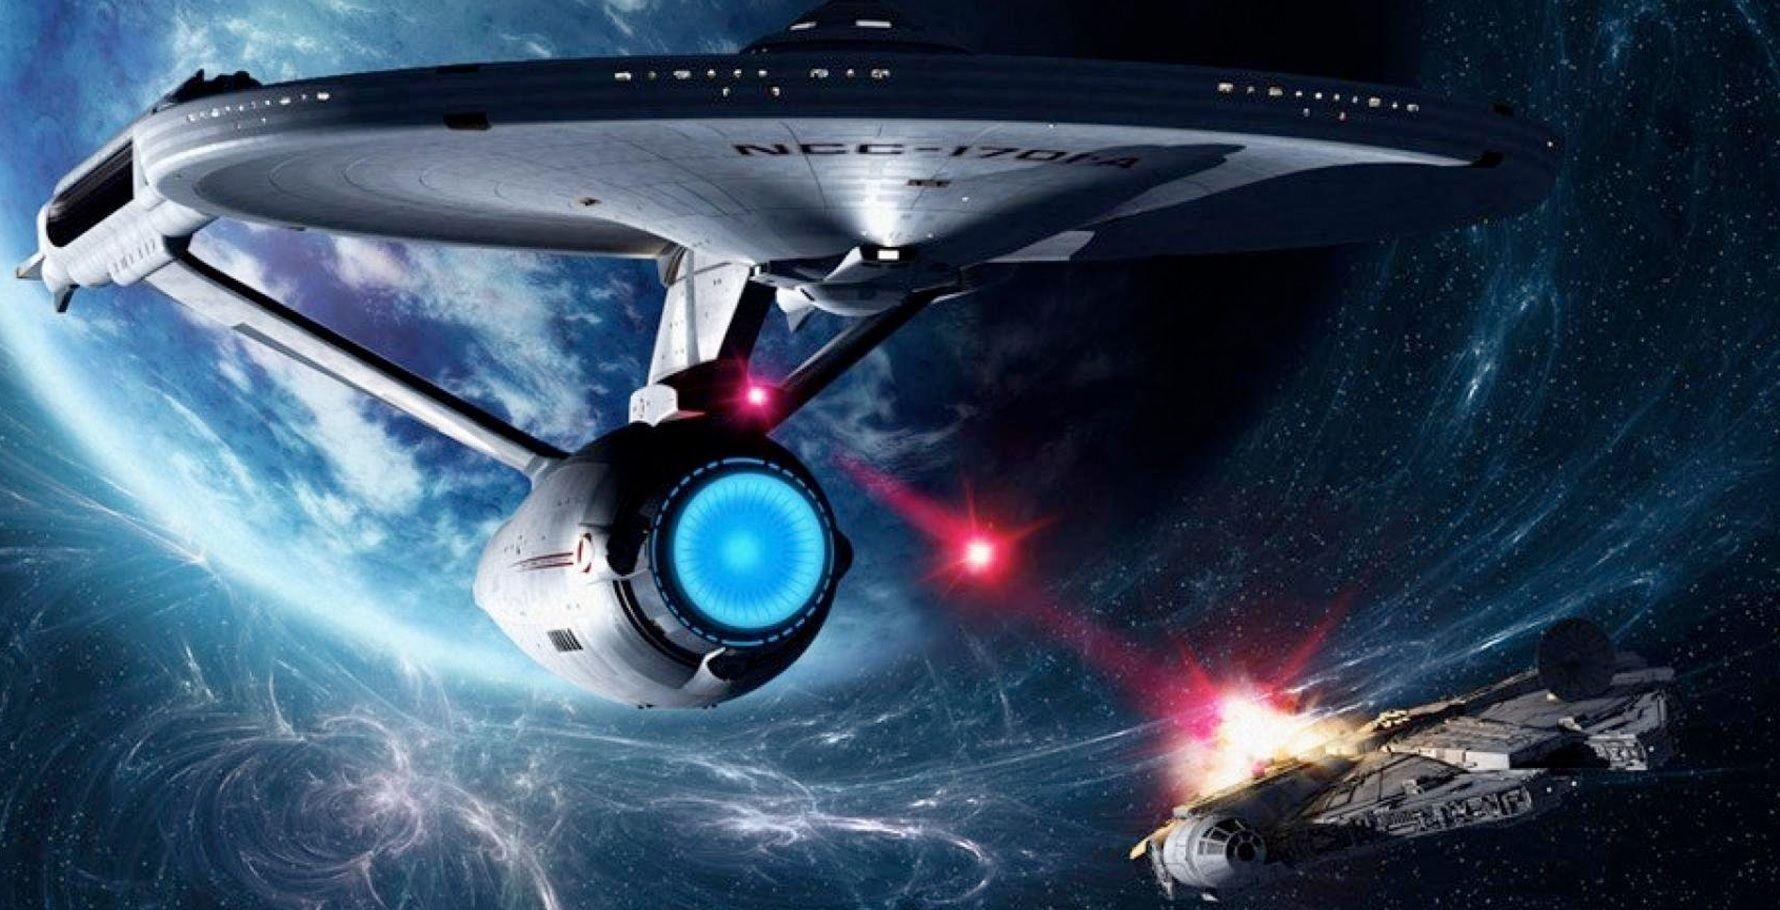 10 Things Star Trek Does Better Than Star Wars